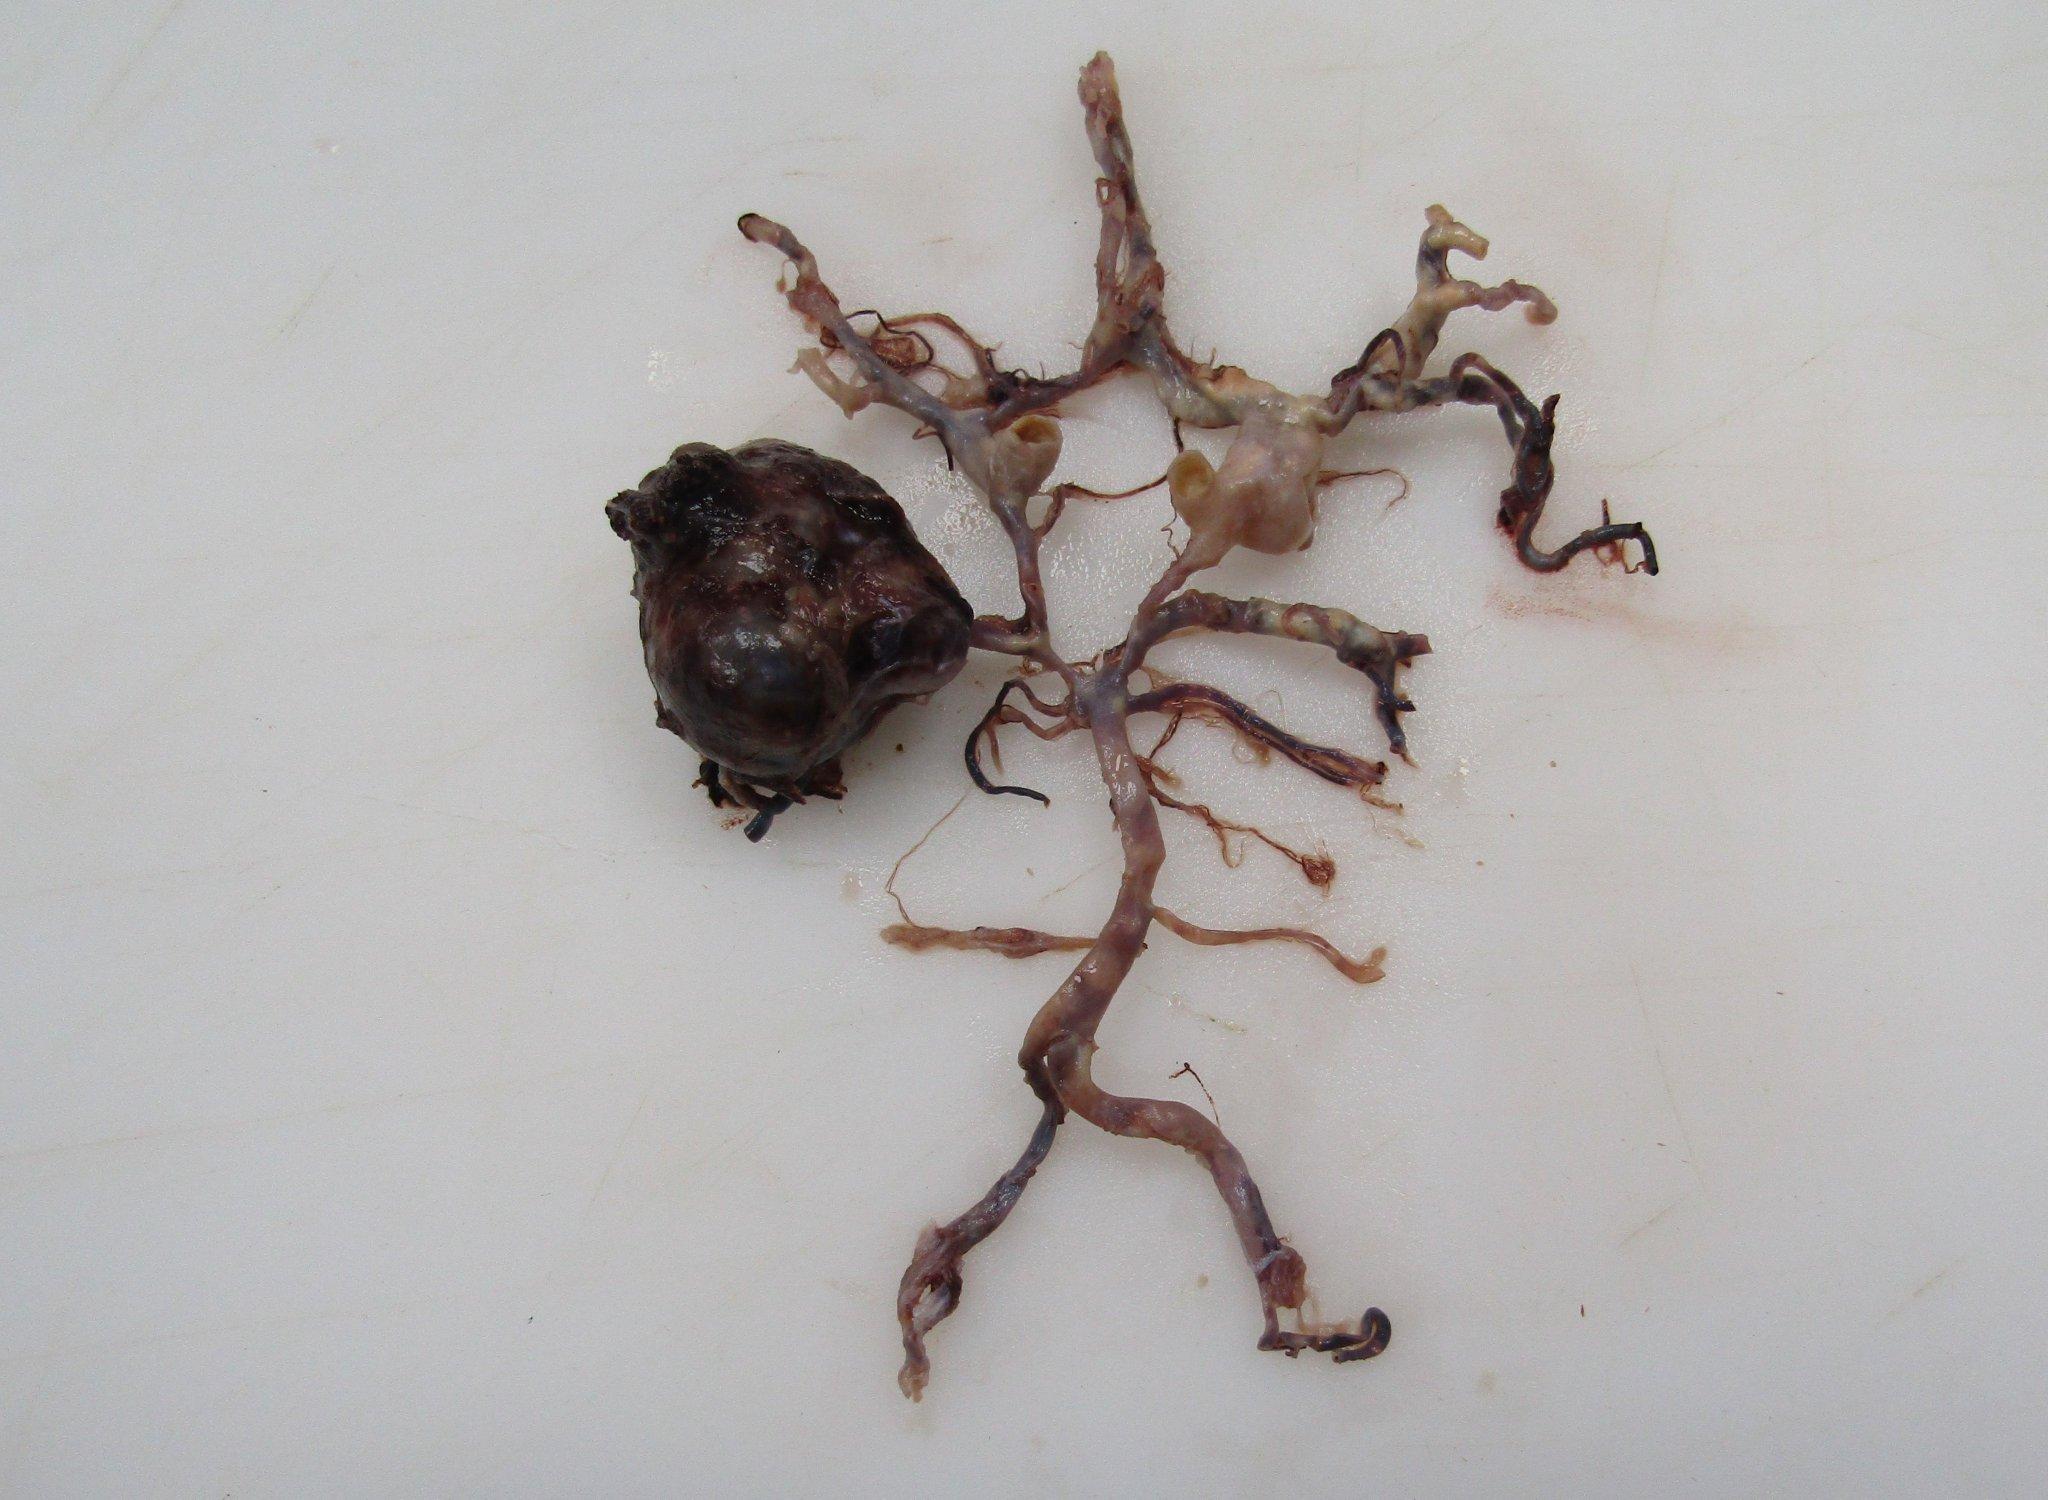 Part of the brain autopsy requires careful examination of the vasculature, although I can see something is wrong 10 feet away...🧐😅  #neuropath #pathtwitter #autopsy @WKemp_MT_FPDoc @yokoda_md @RFecherMD @AnitaArackal @anjuthevirgo @ridin_bk_MD @JMGardnerMD @drjudymelinek https://t.co/fWv2beNK3L